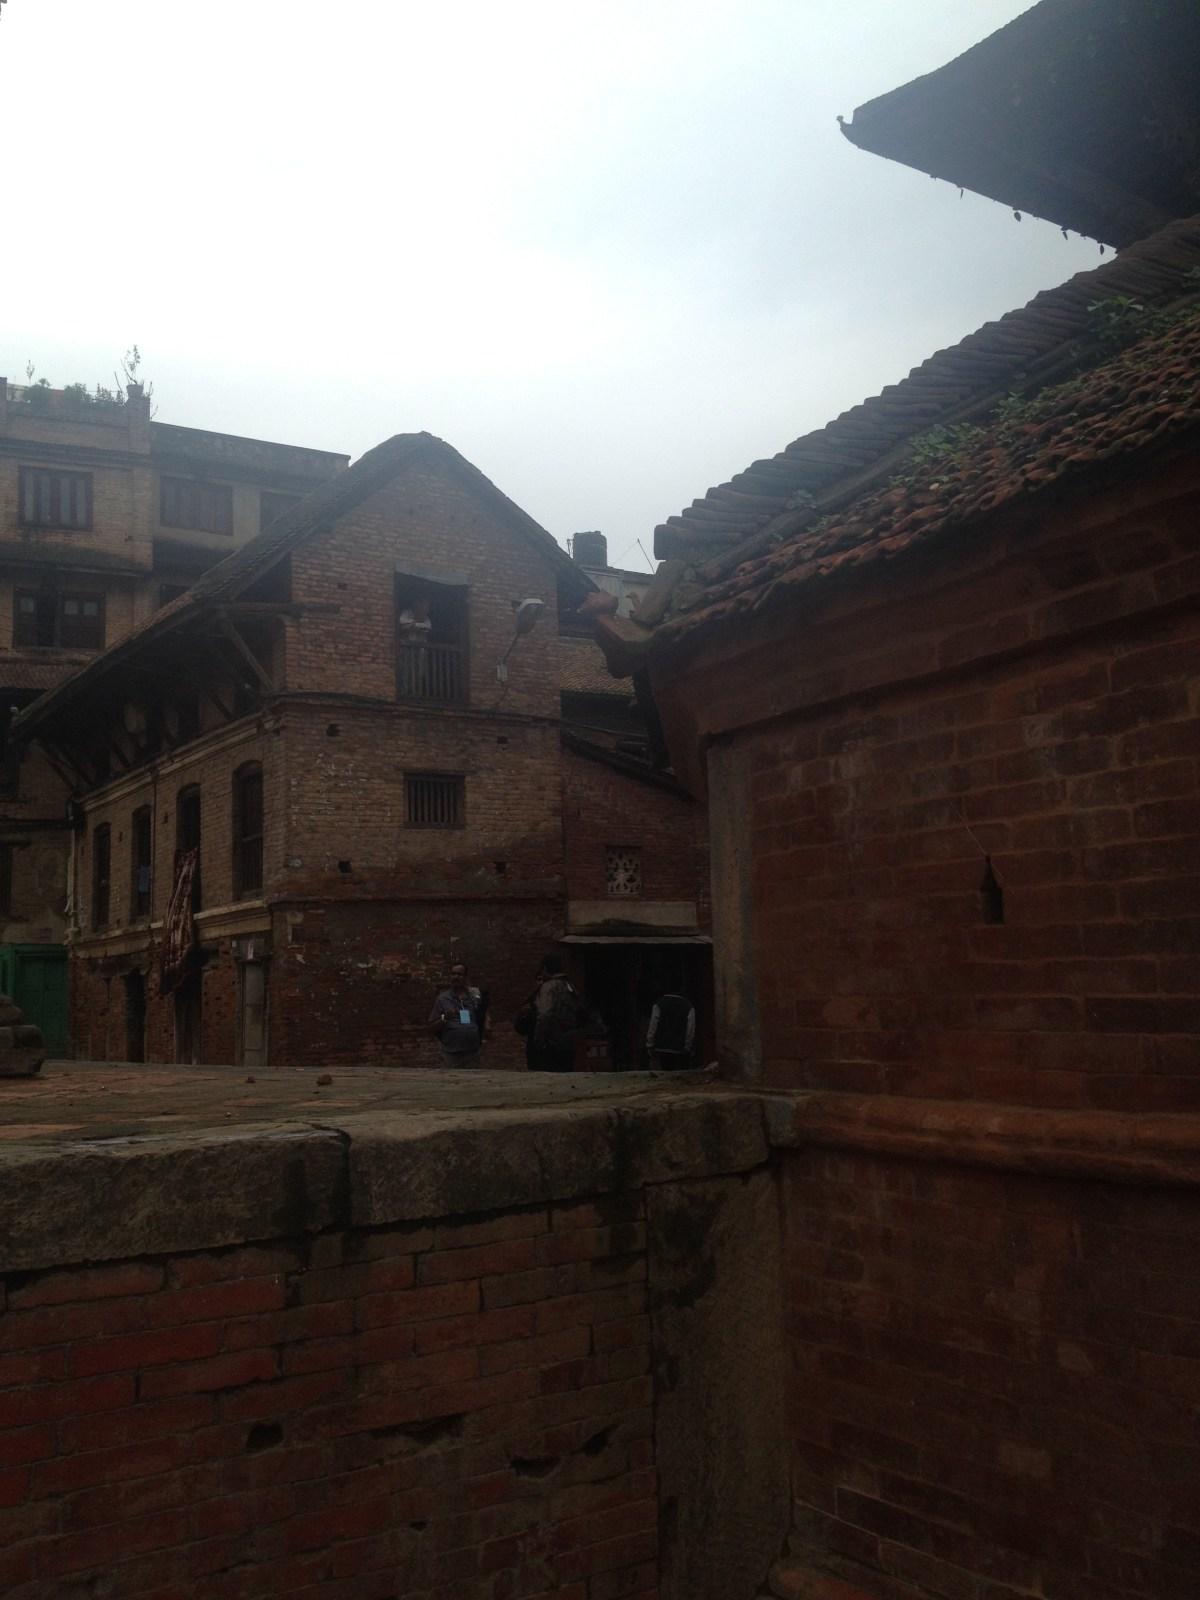 Nepal Travel: Restrooms at Durbar Square